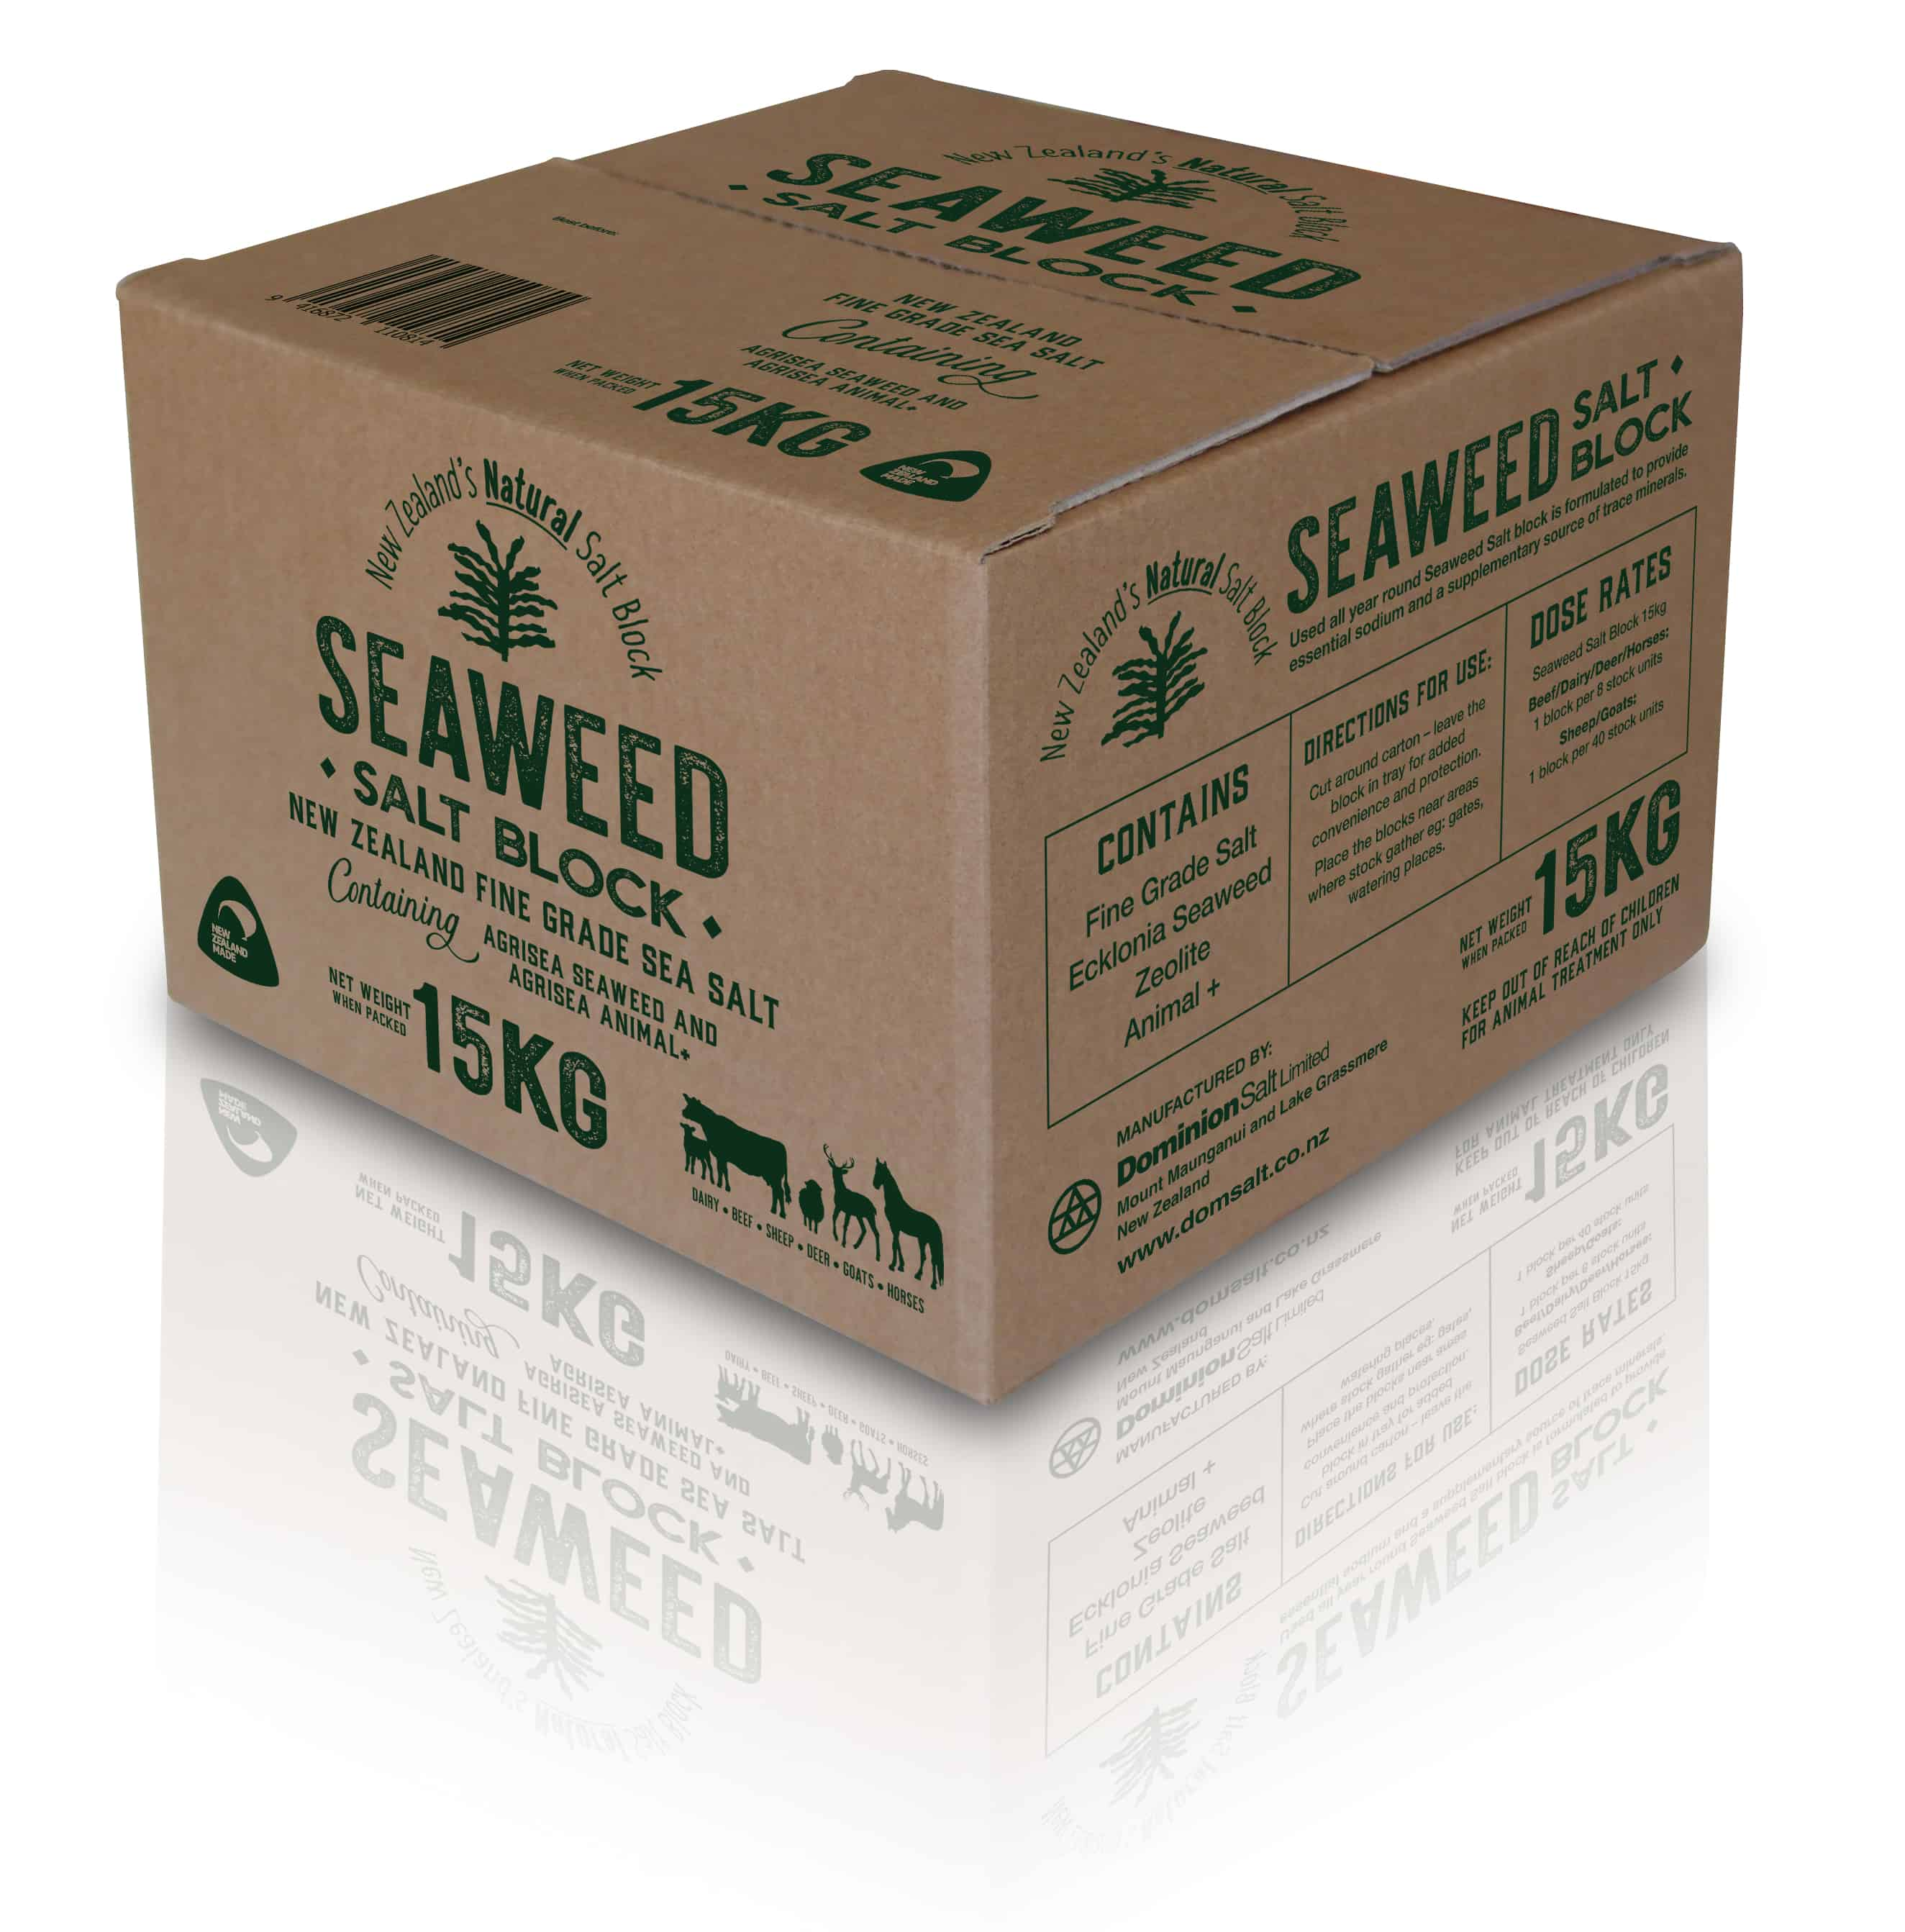 Natural Seaweed 15kg Block - in store now!